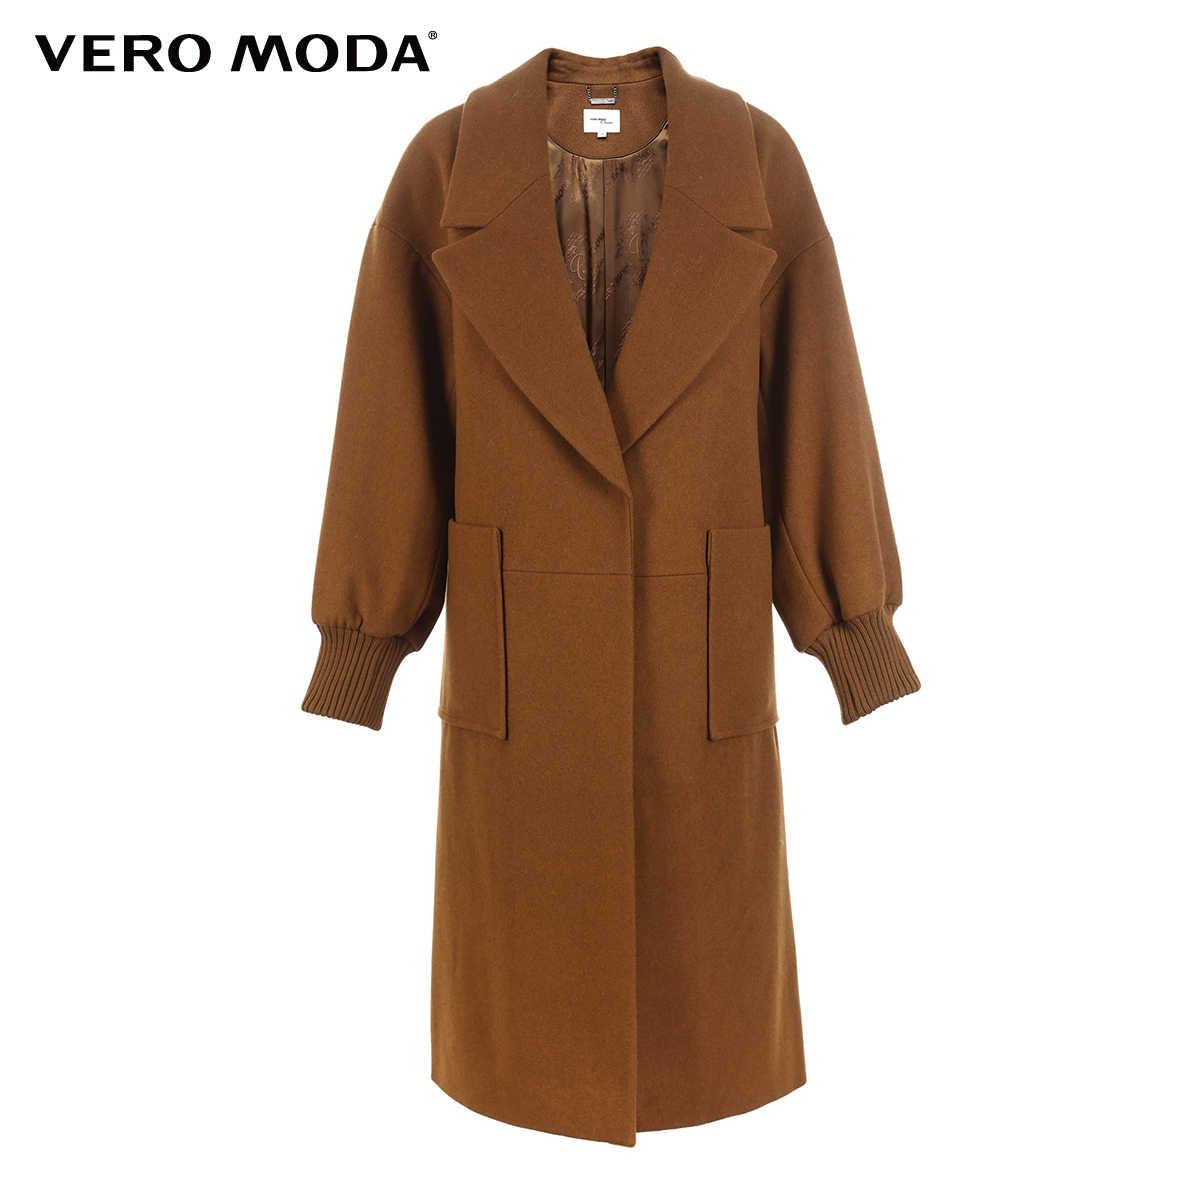 Vero Moda neue arbeitsplatz lose fit minimalis revers wolle mantel frauen   318427507